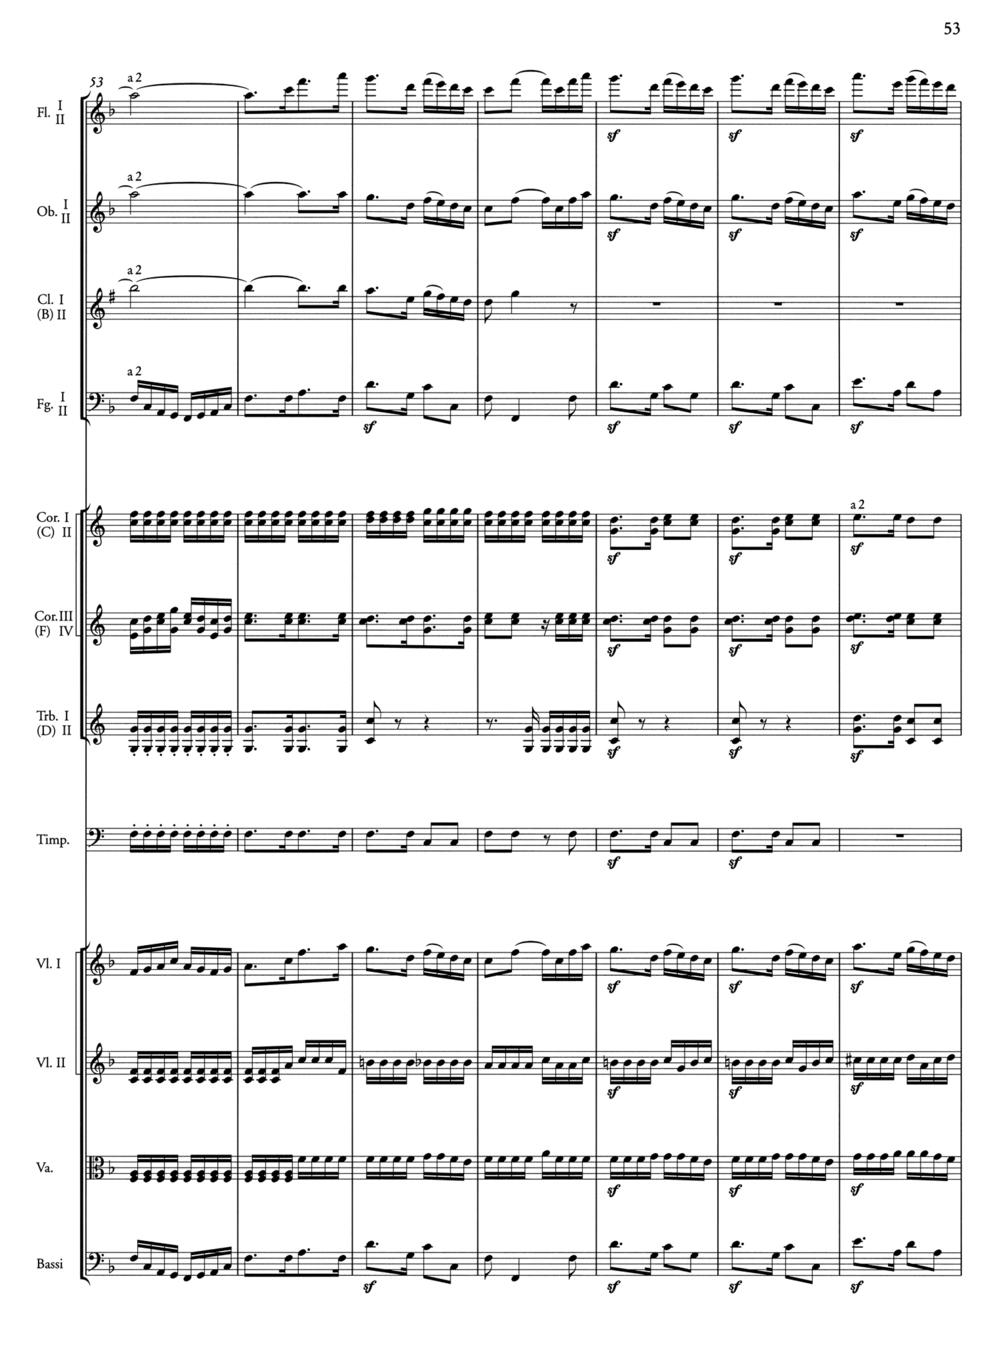 Mendelssohn Score Page 2.jpg